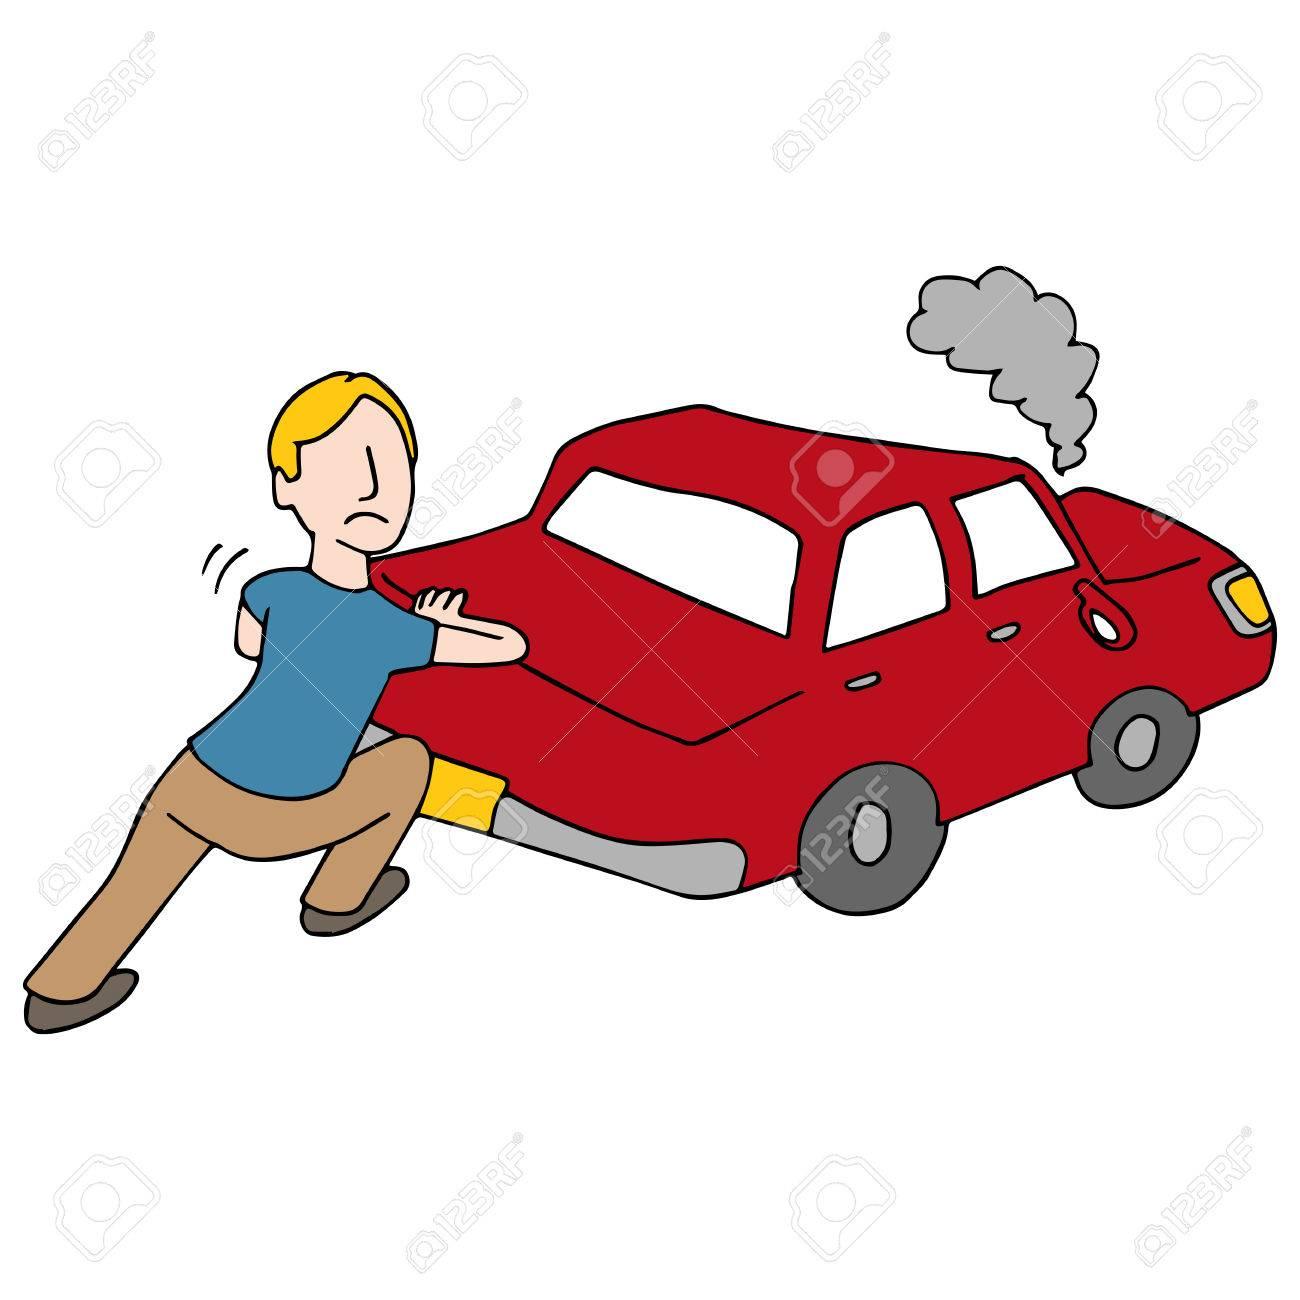 1300x1300 An Image Of A Man Pushing Broken Down Car. Royalty Free Cliparts